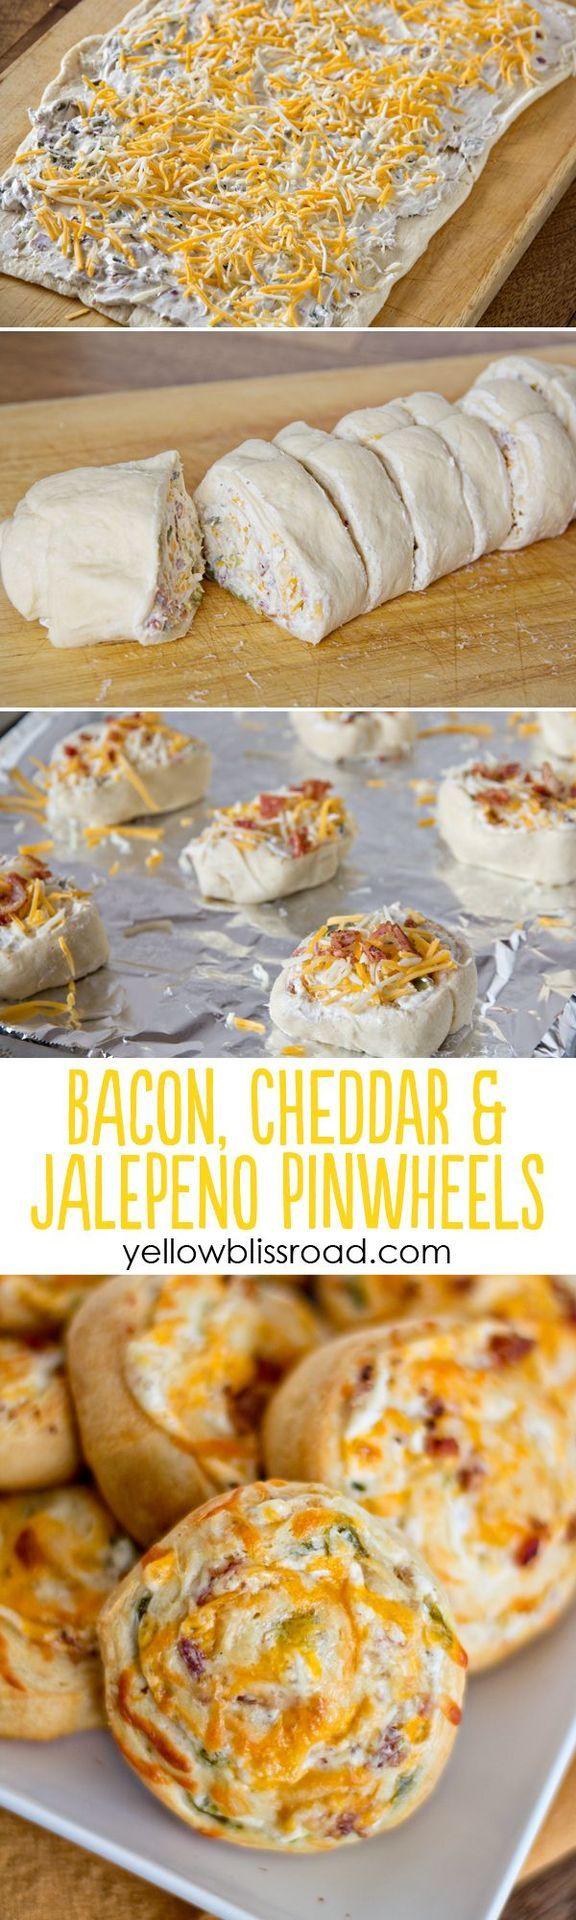 Bacon Cheddar & Jalape?o Pinwheels - Food Menu Stock Pictures